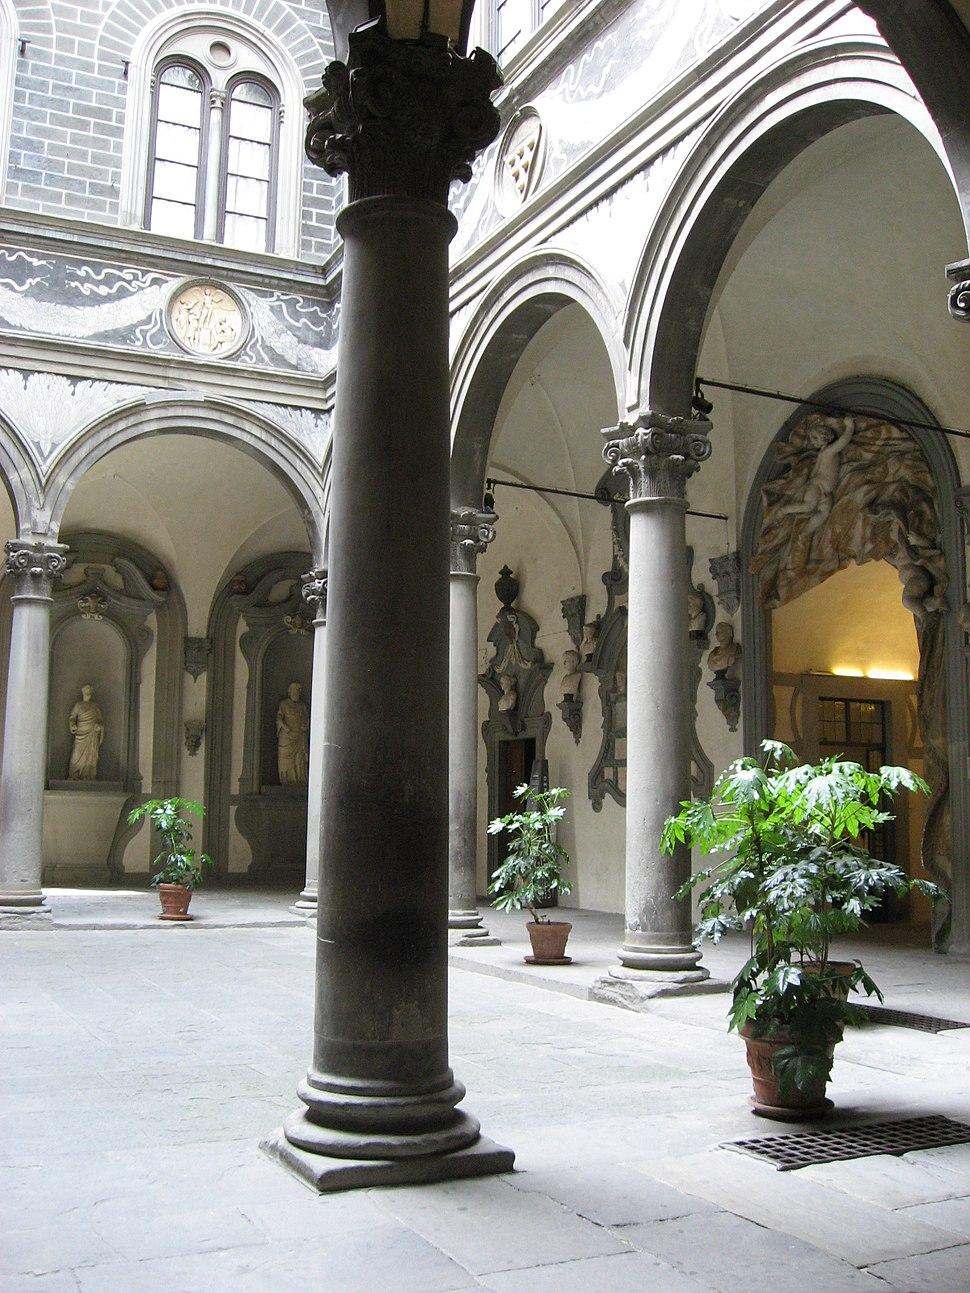 Palazzo Medici courtyard Apr 2008 (10)